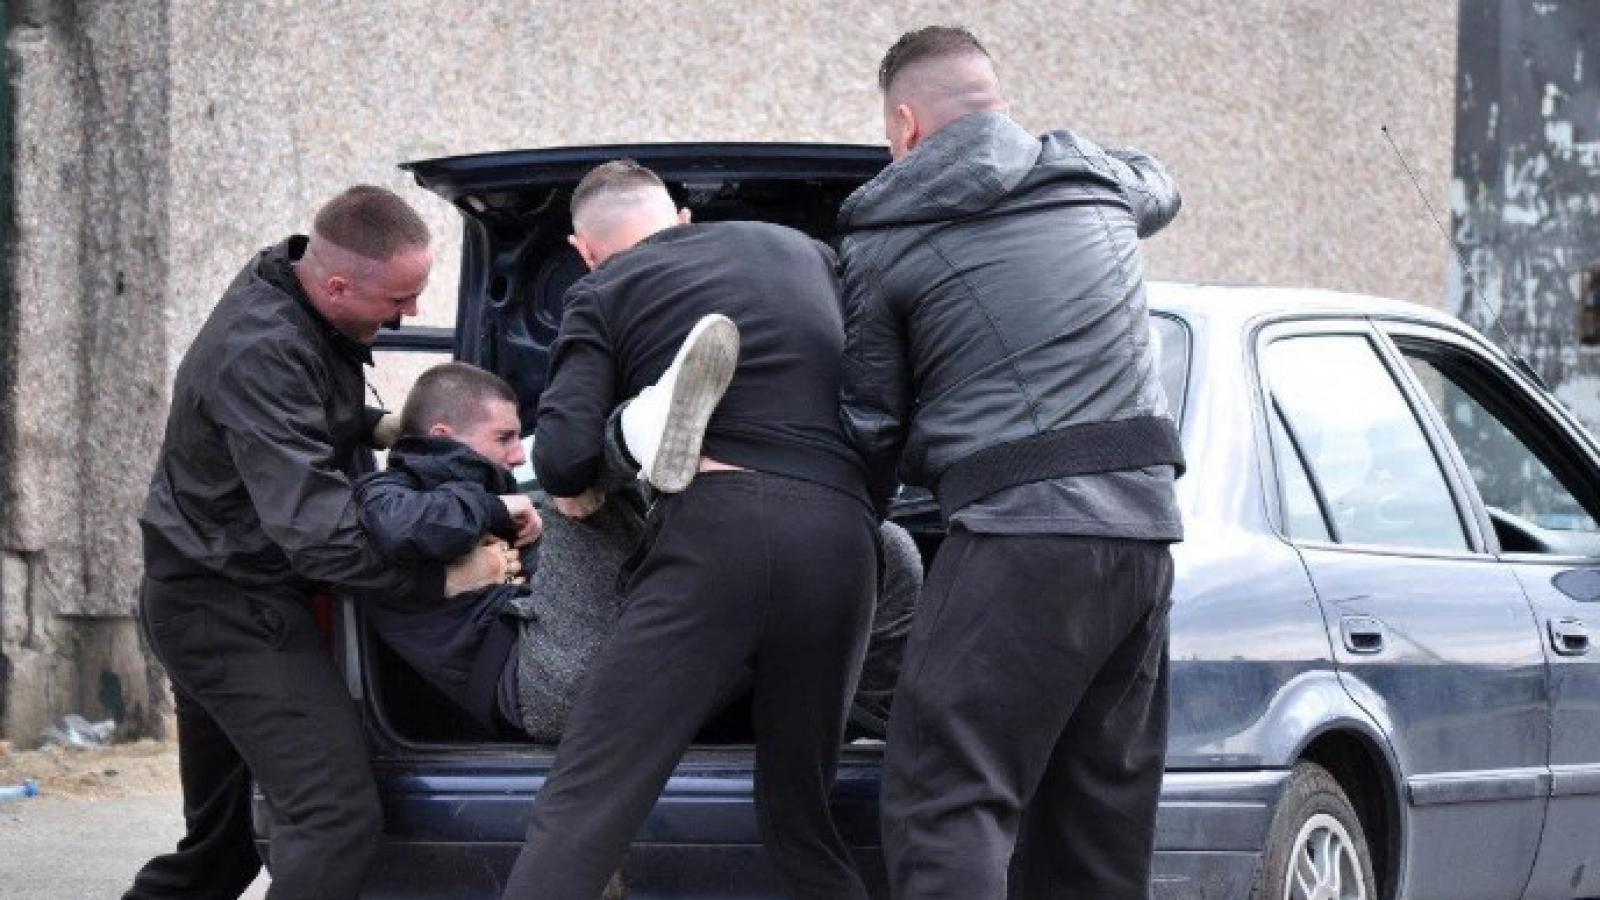 Вологжанина увезли на кладбище и ограбили